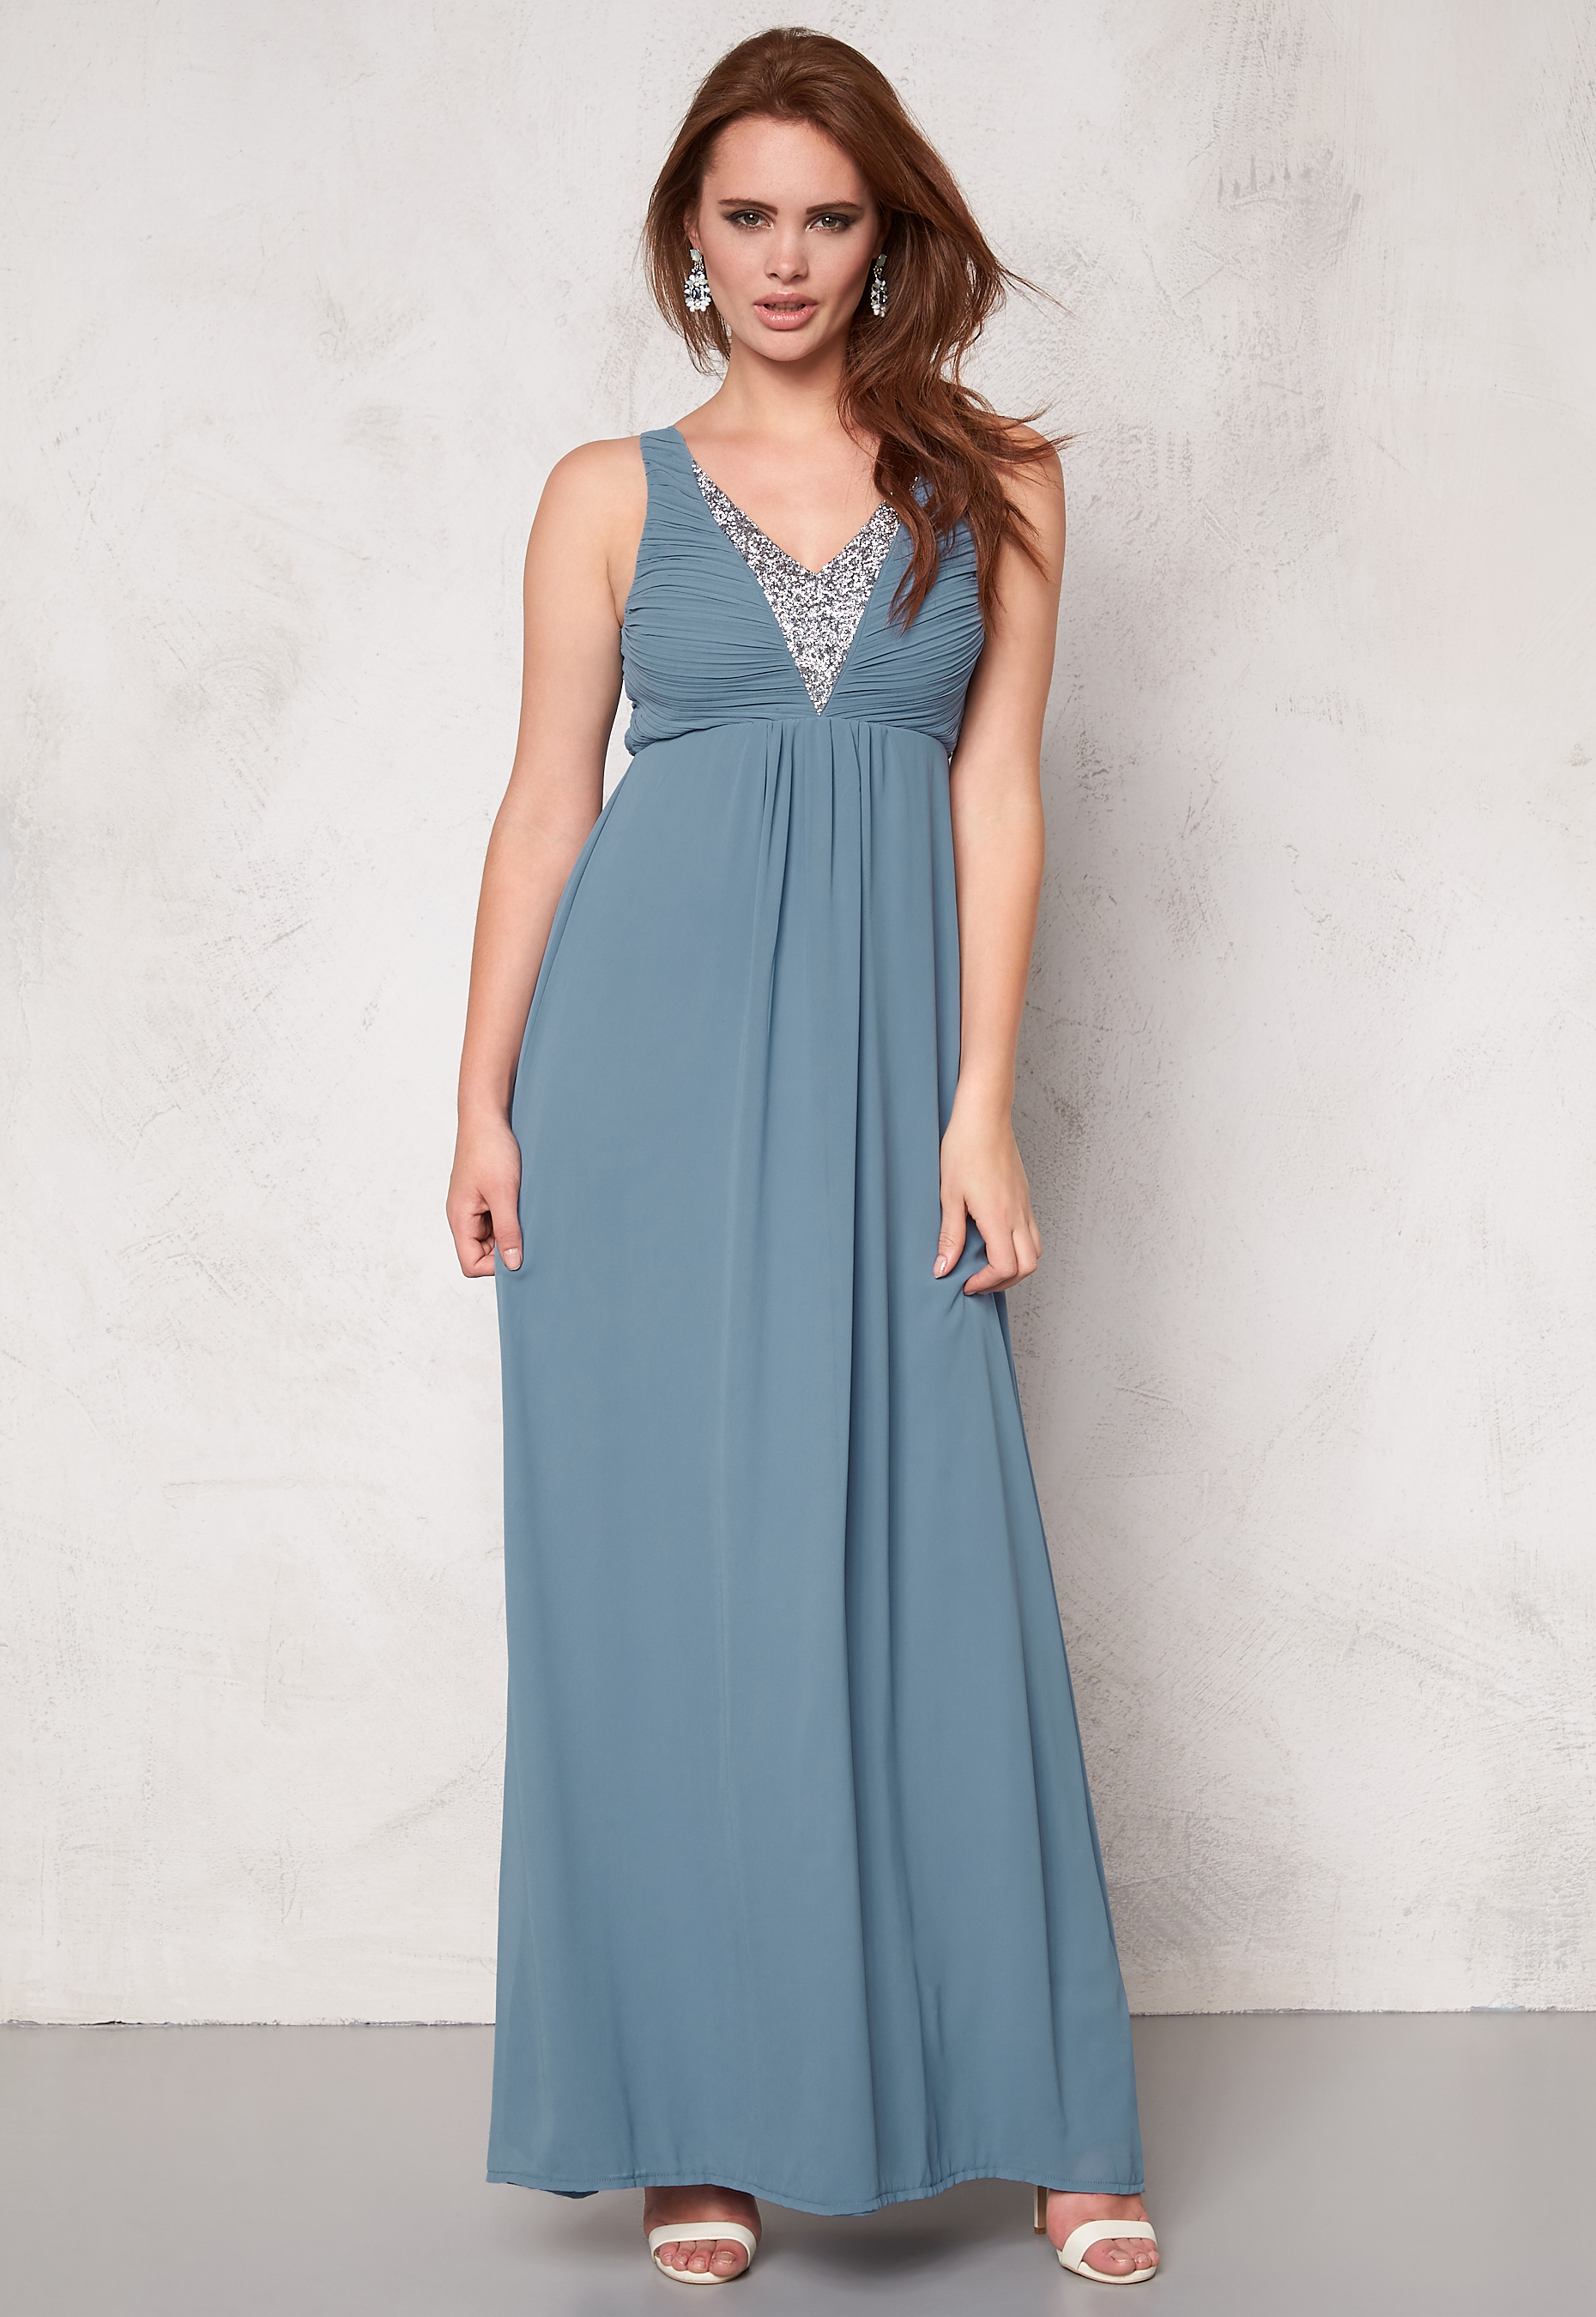 Enchanting Maternity Bridesmaid Dresses Cheap Embellishment - All ...